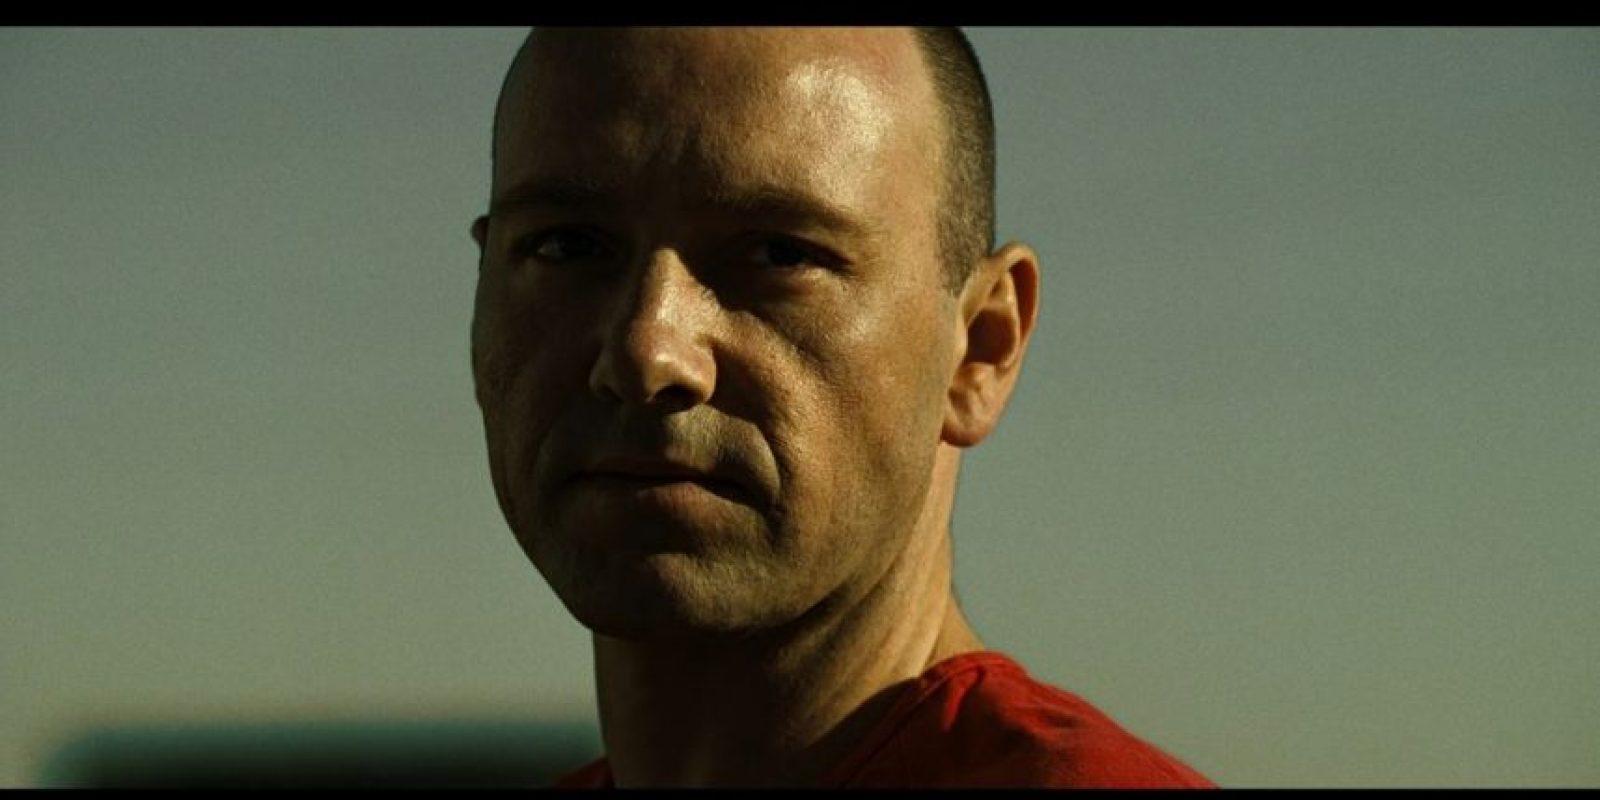 """John Doe"" (""Seven"") Foto:New Line Cinema. Imagen Por:"